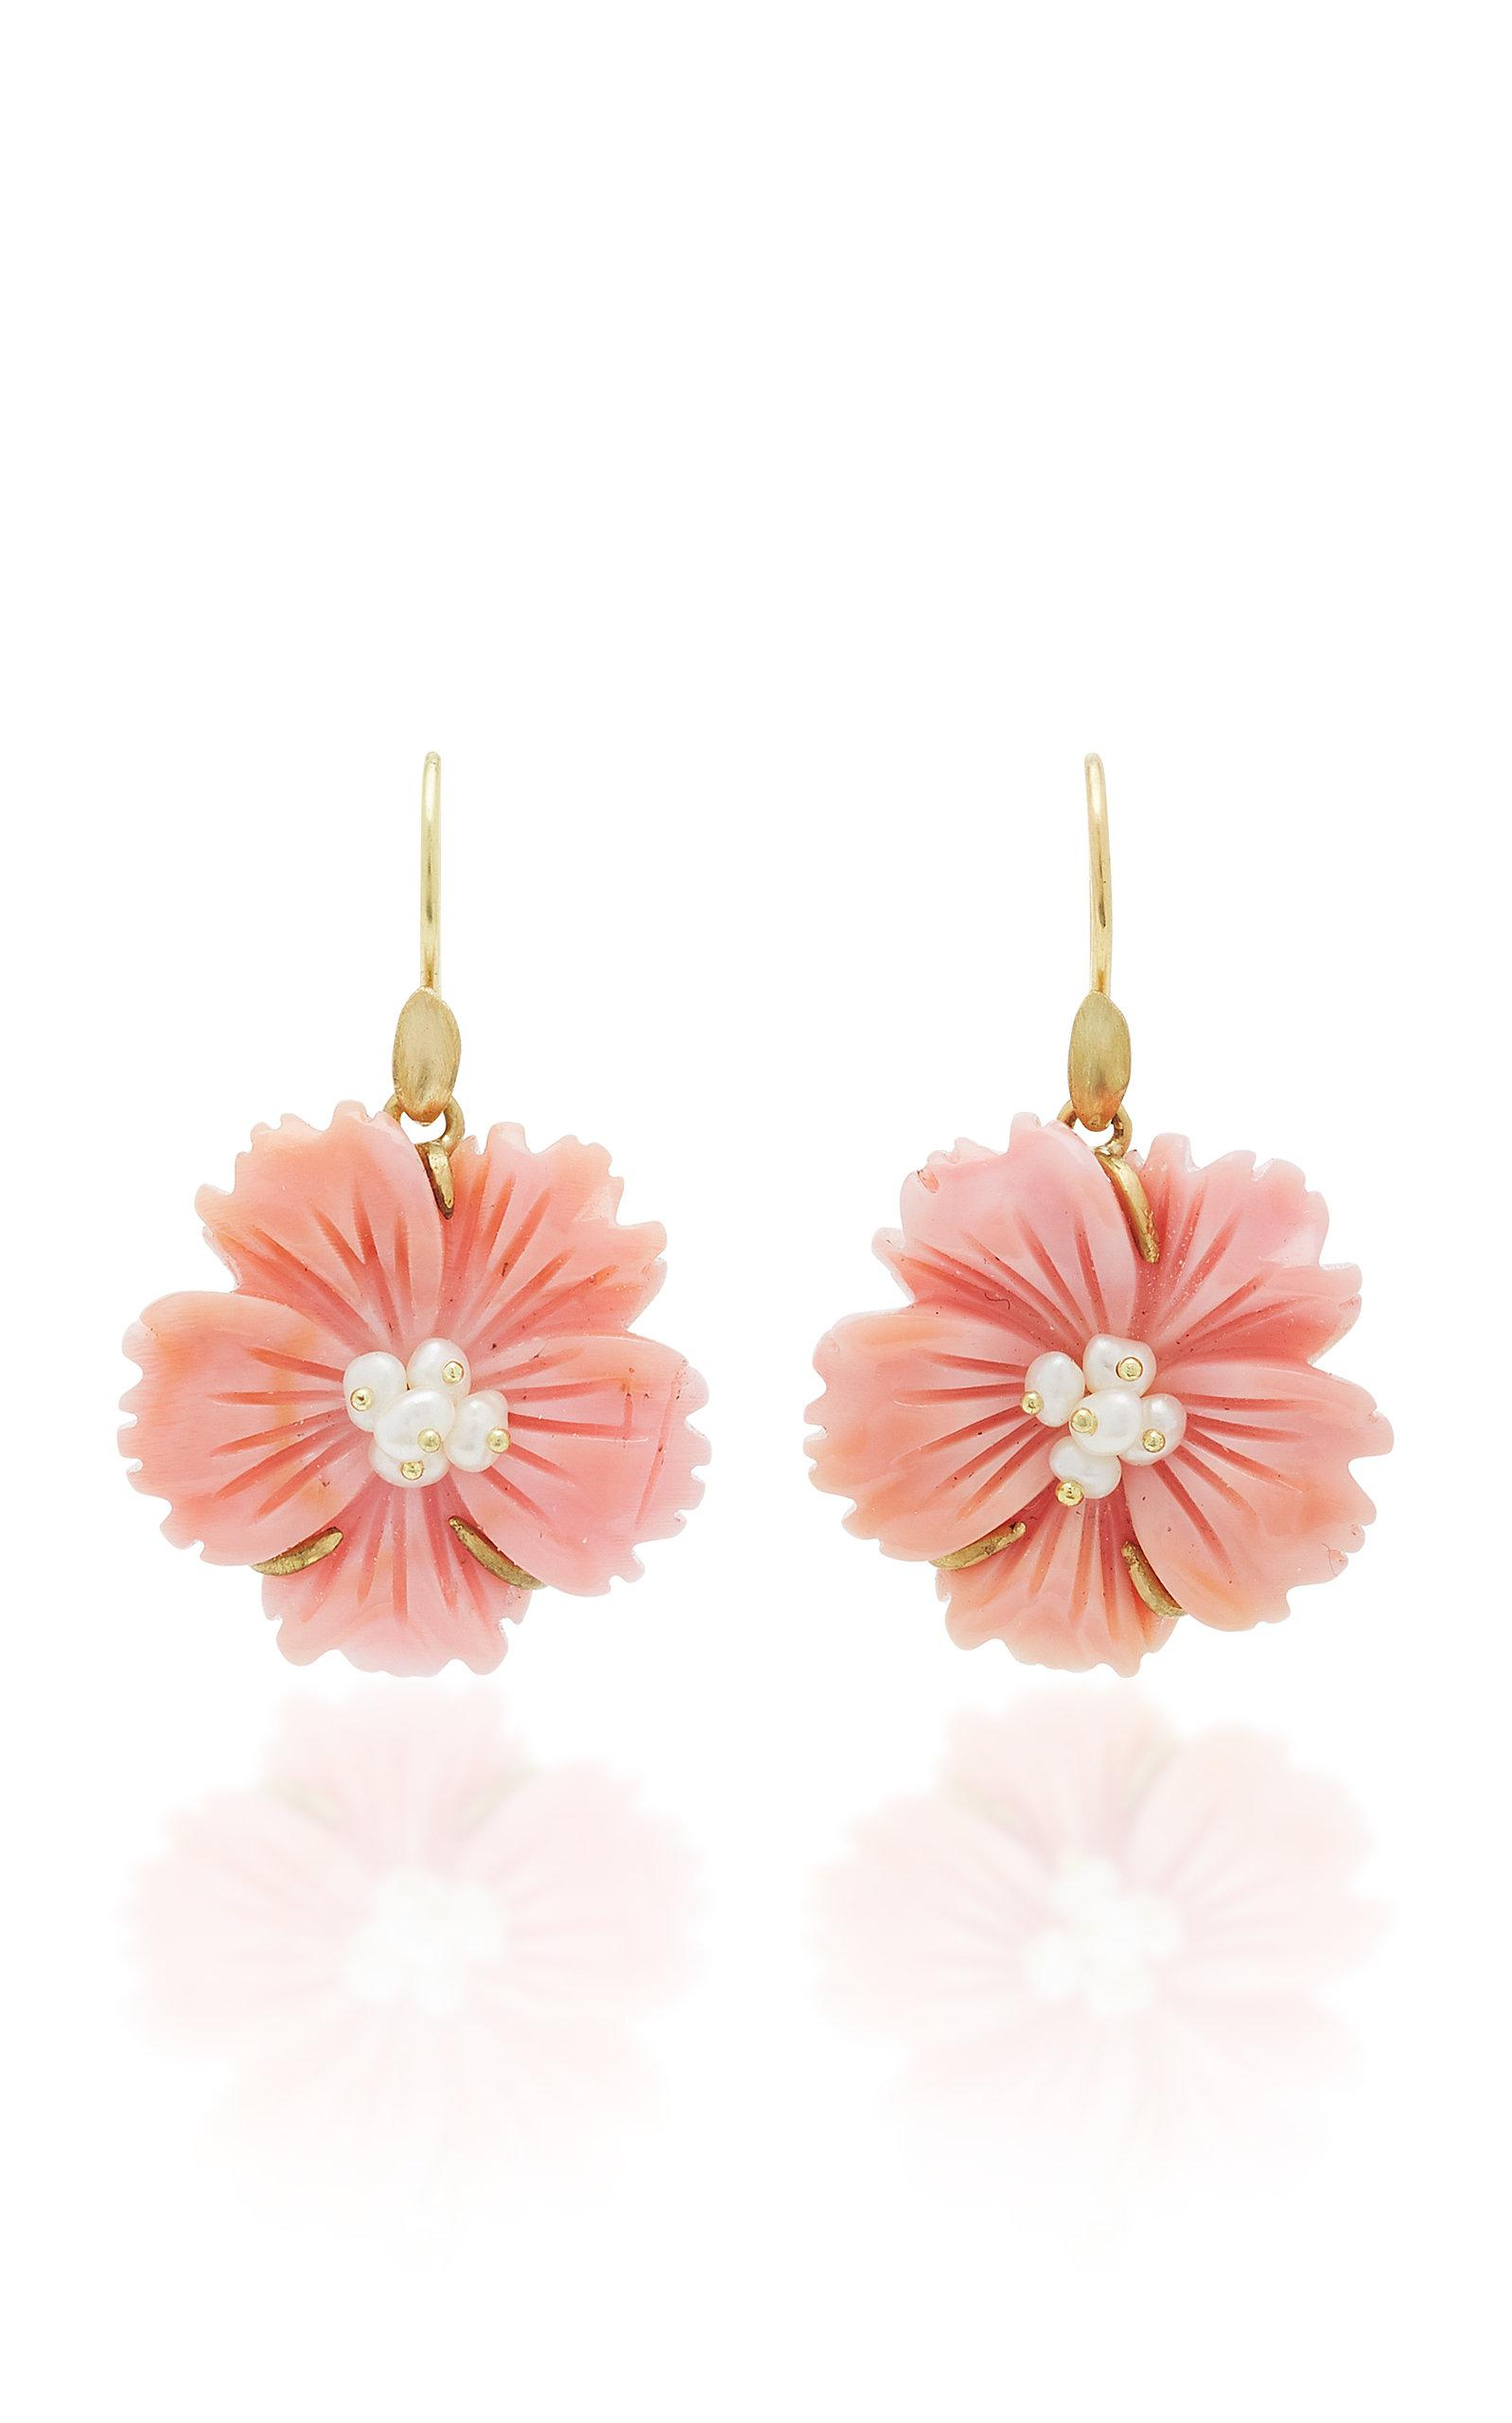 18K Gold Pearl and Conch Shell Earrings Annette Ferdinandsen WQncywm